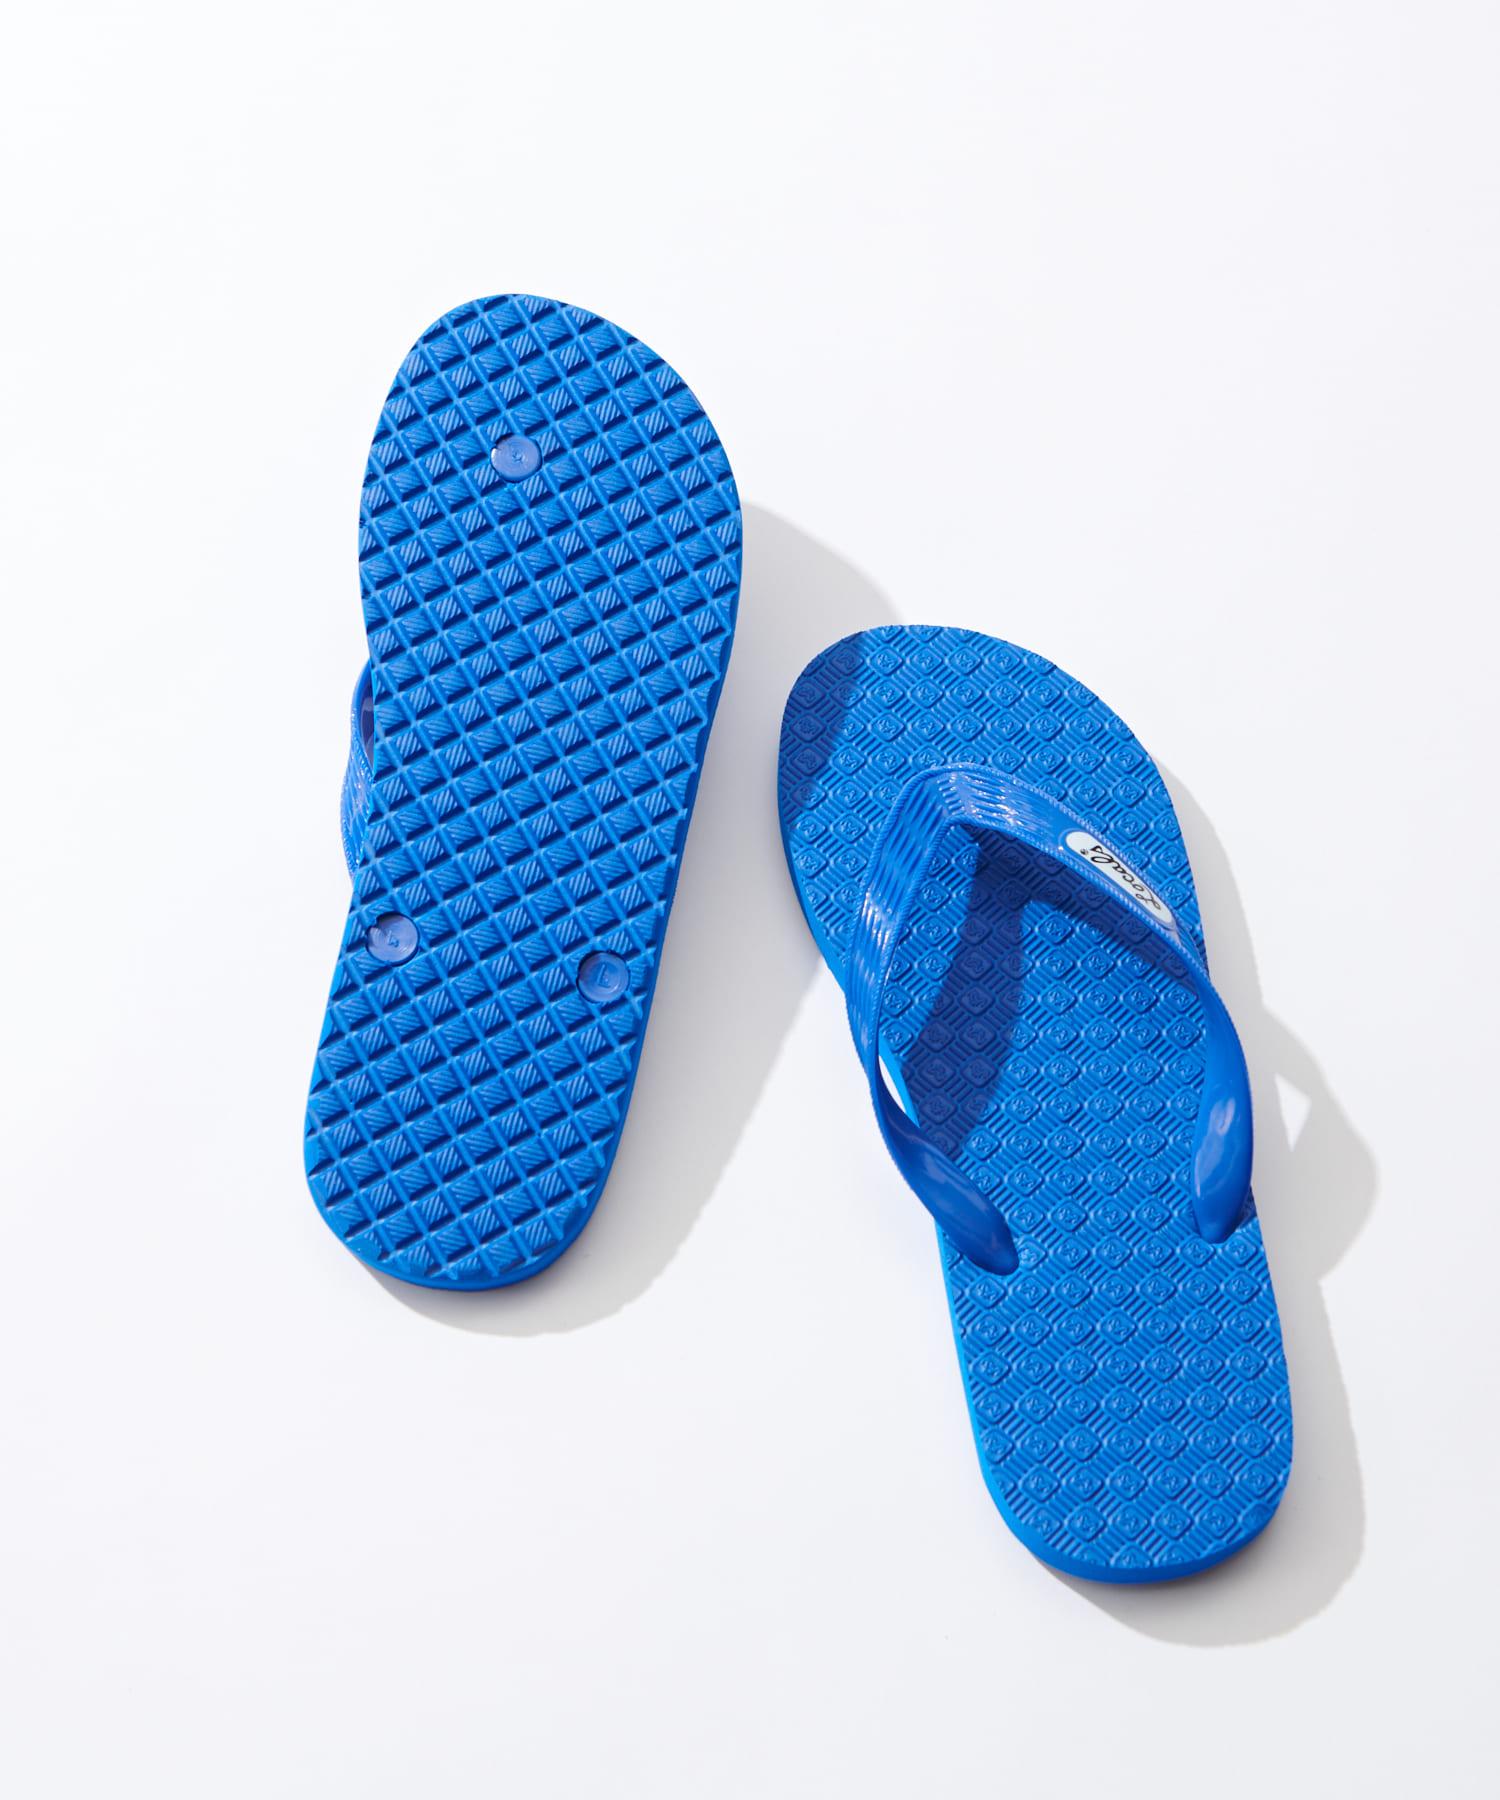 CIAOPANIC(チャオパニック) EC限定 LOCALS ブルー